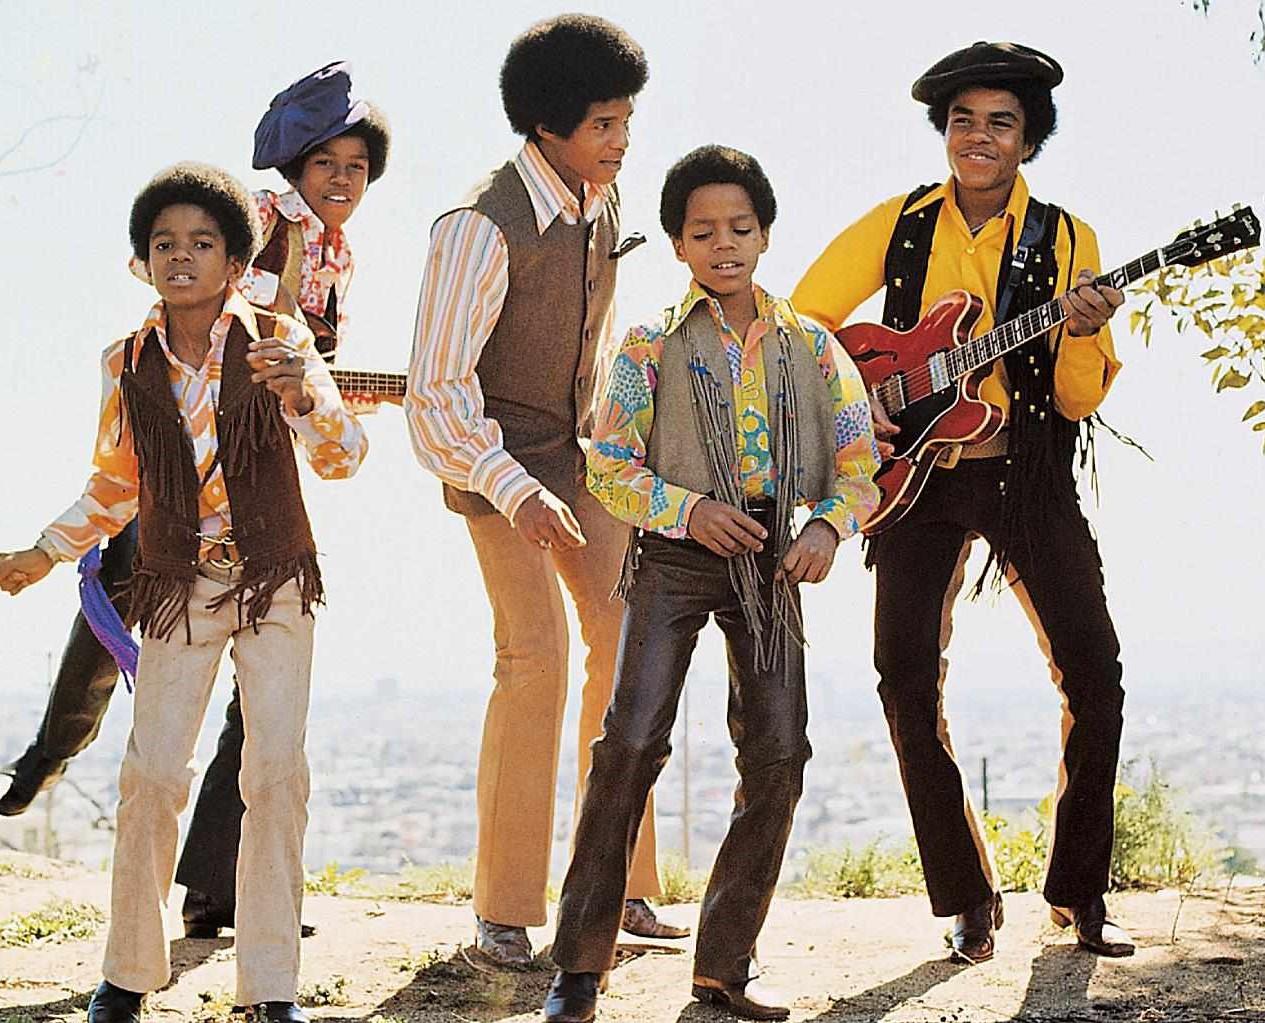 Michael Jackson & Jackson 5 / I want you back